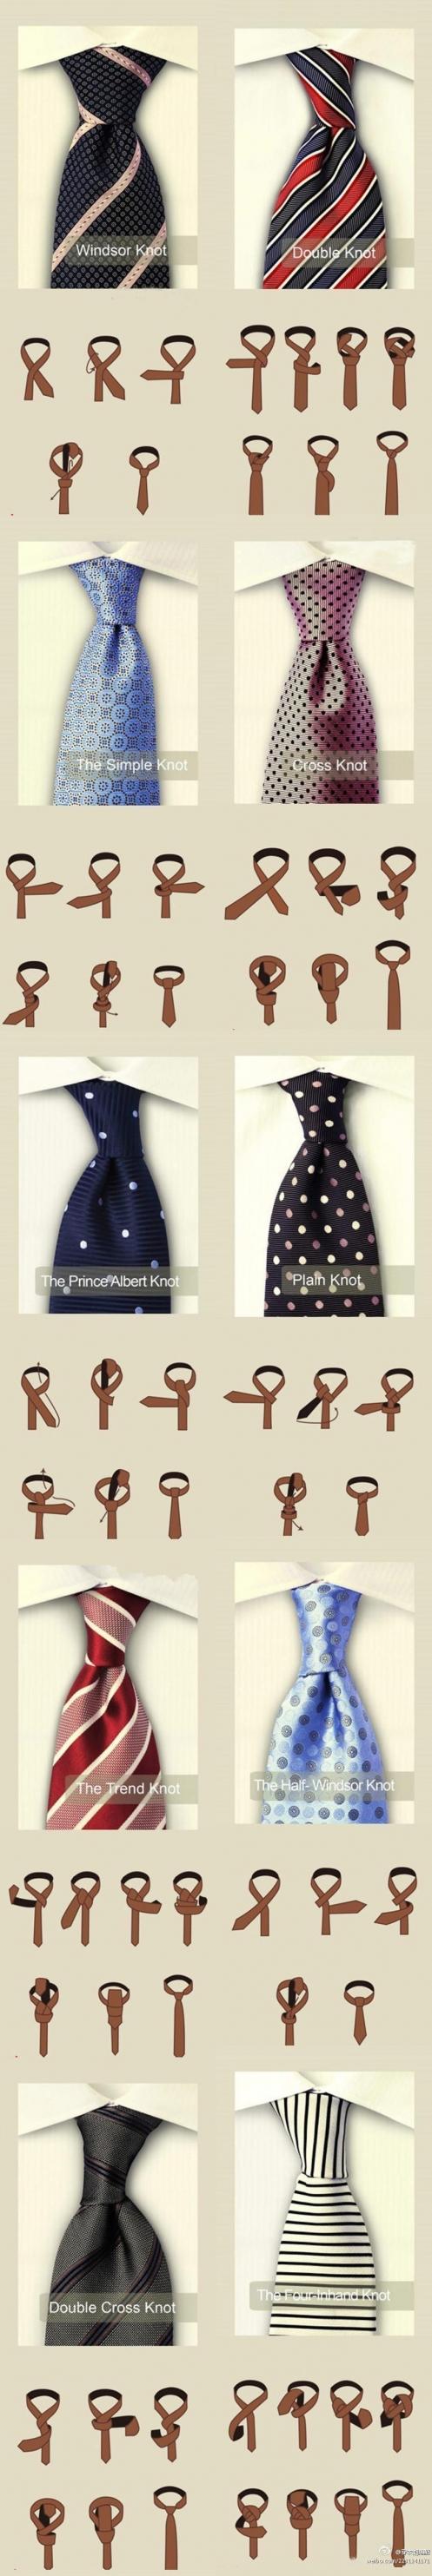 Tramaine Taylor- MUNDANE (synonym) ordinary ways on how to tie a tie.